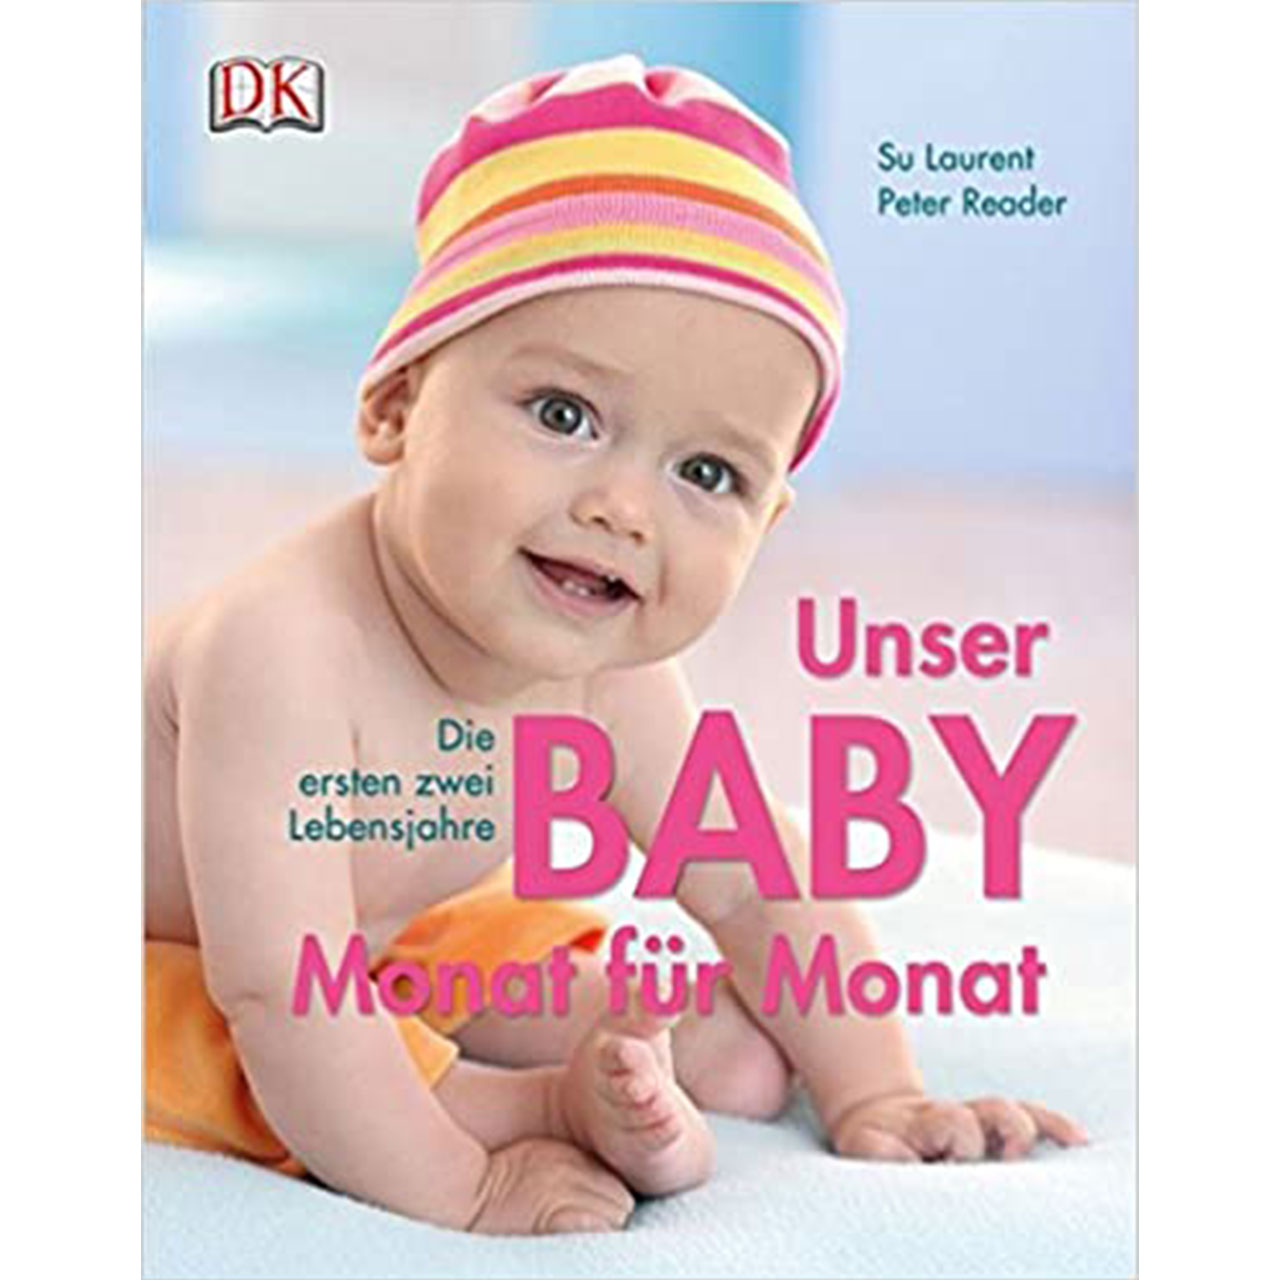 Unser-Baby-Monat-fuer-Monat